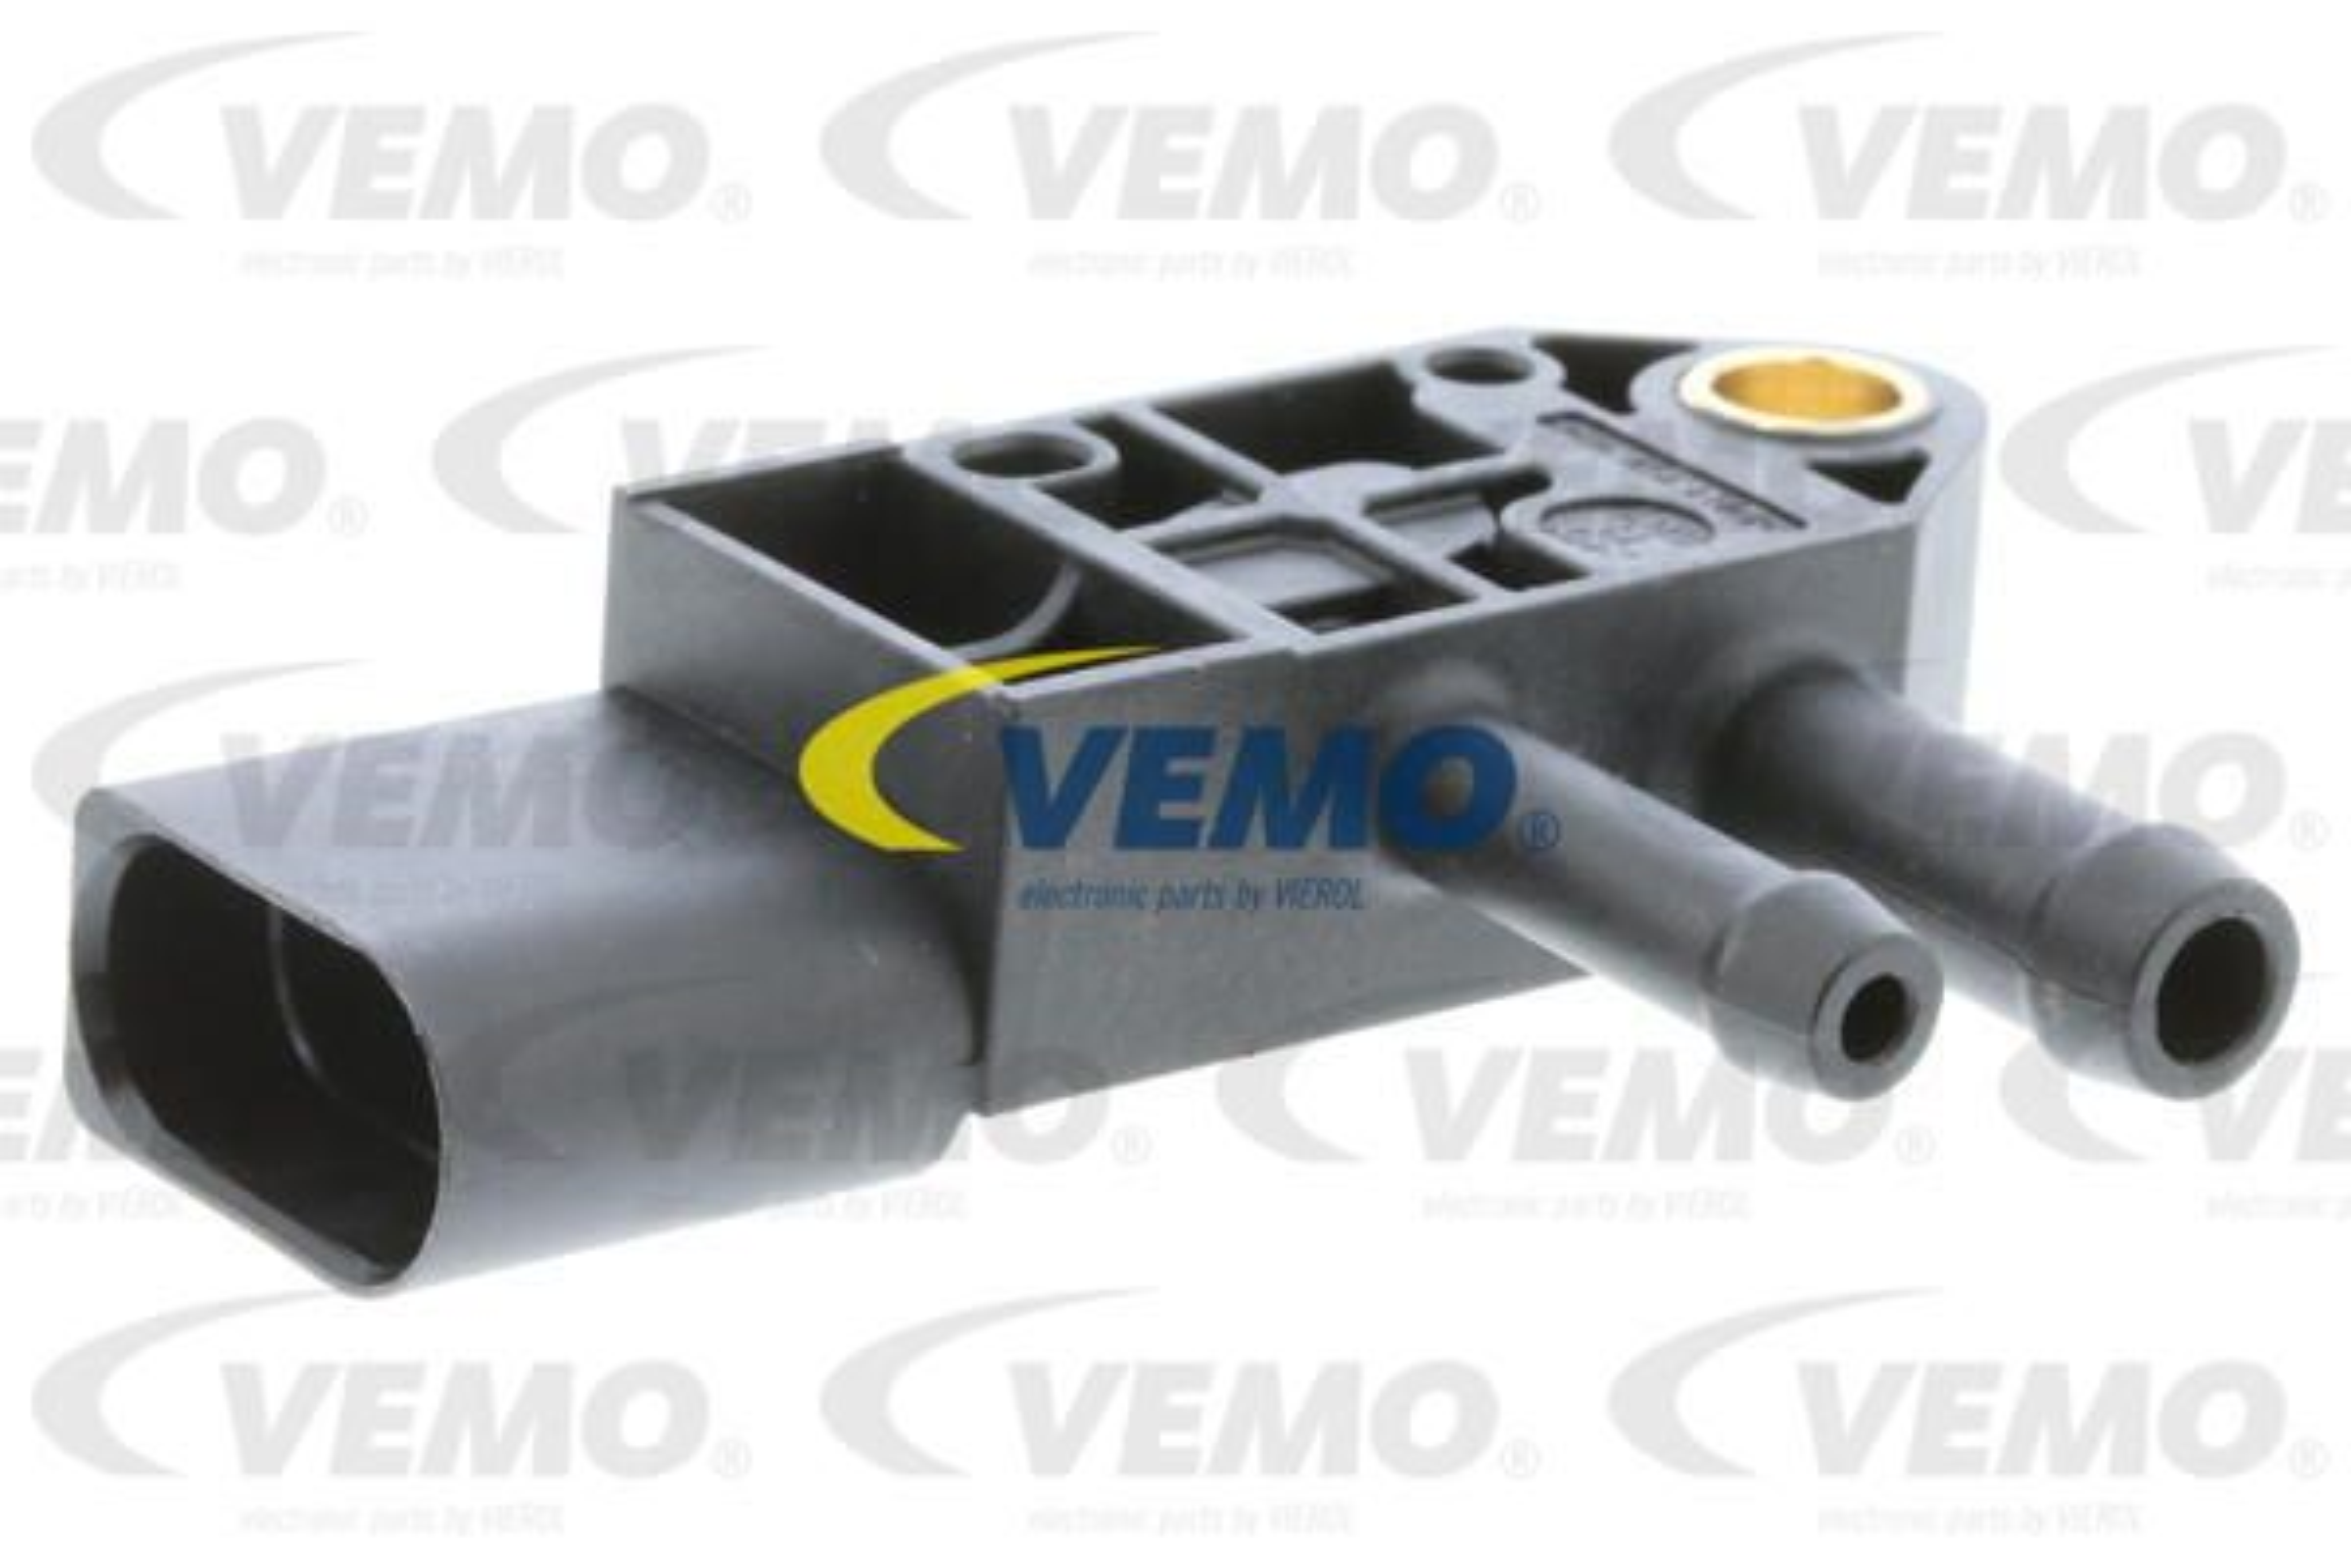 AUDI A6 2016 Differenzdrucksensor - Original VEMO V10-72-1207 Pol-Anzahl: 3-polig